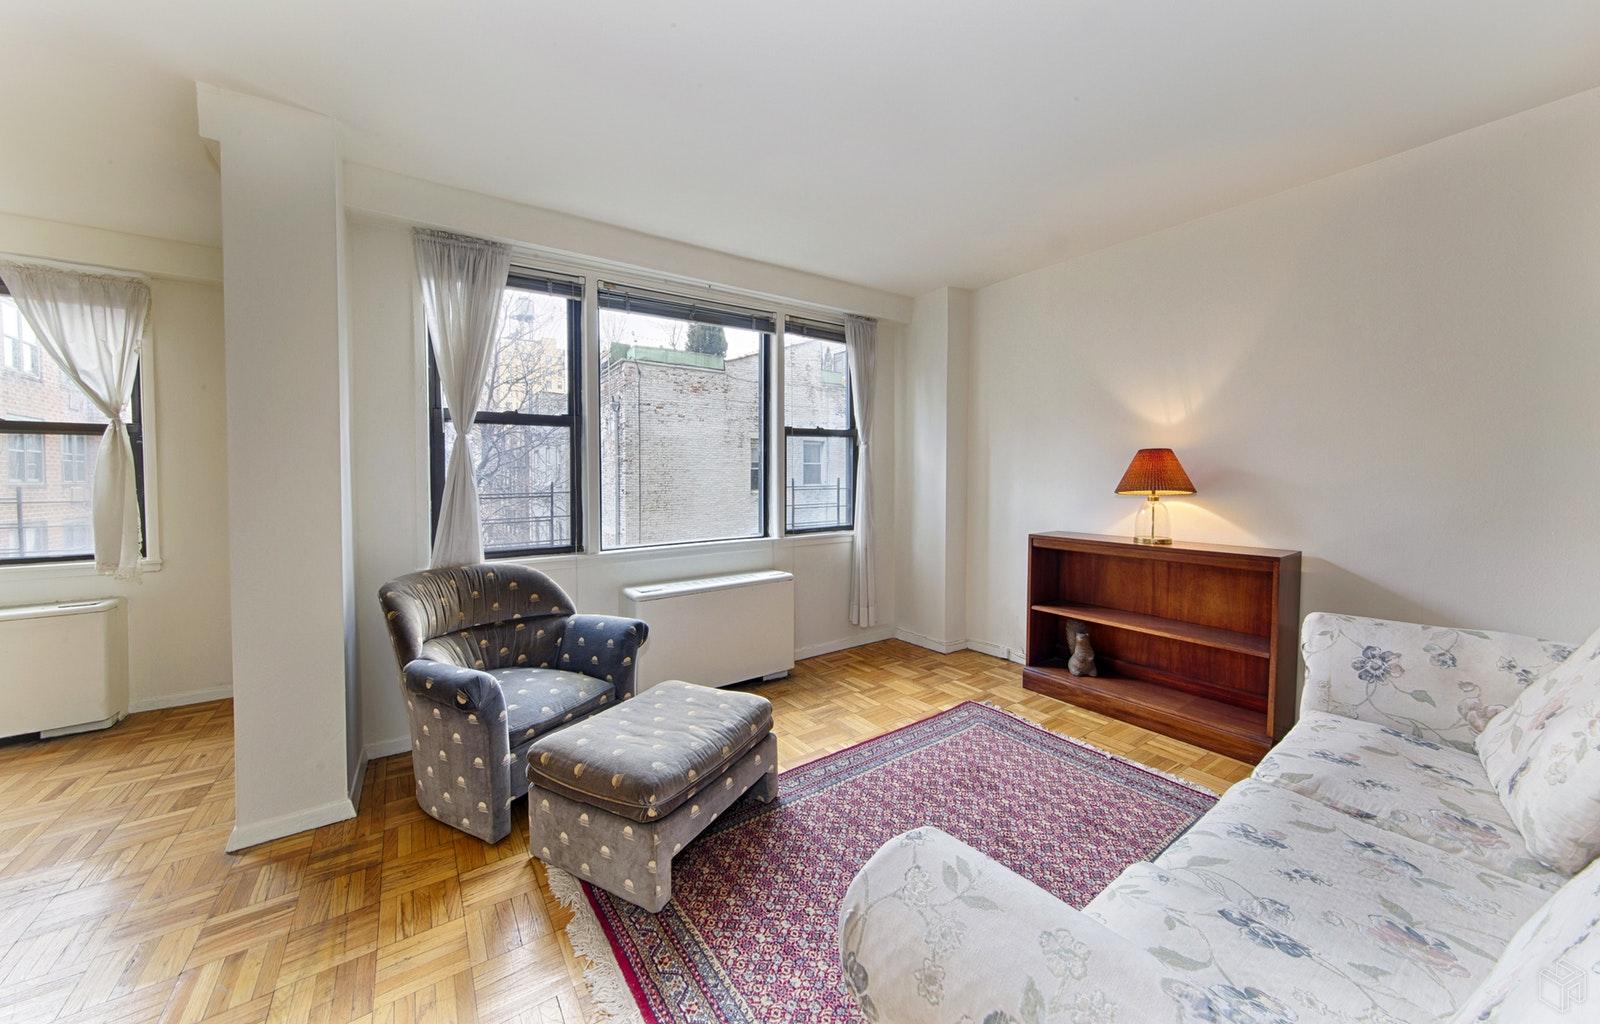 201 EAST 21ST STREET, Gramercy Park, $0, Web #: 19102693